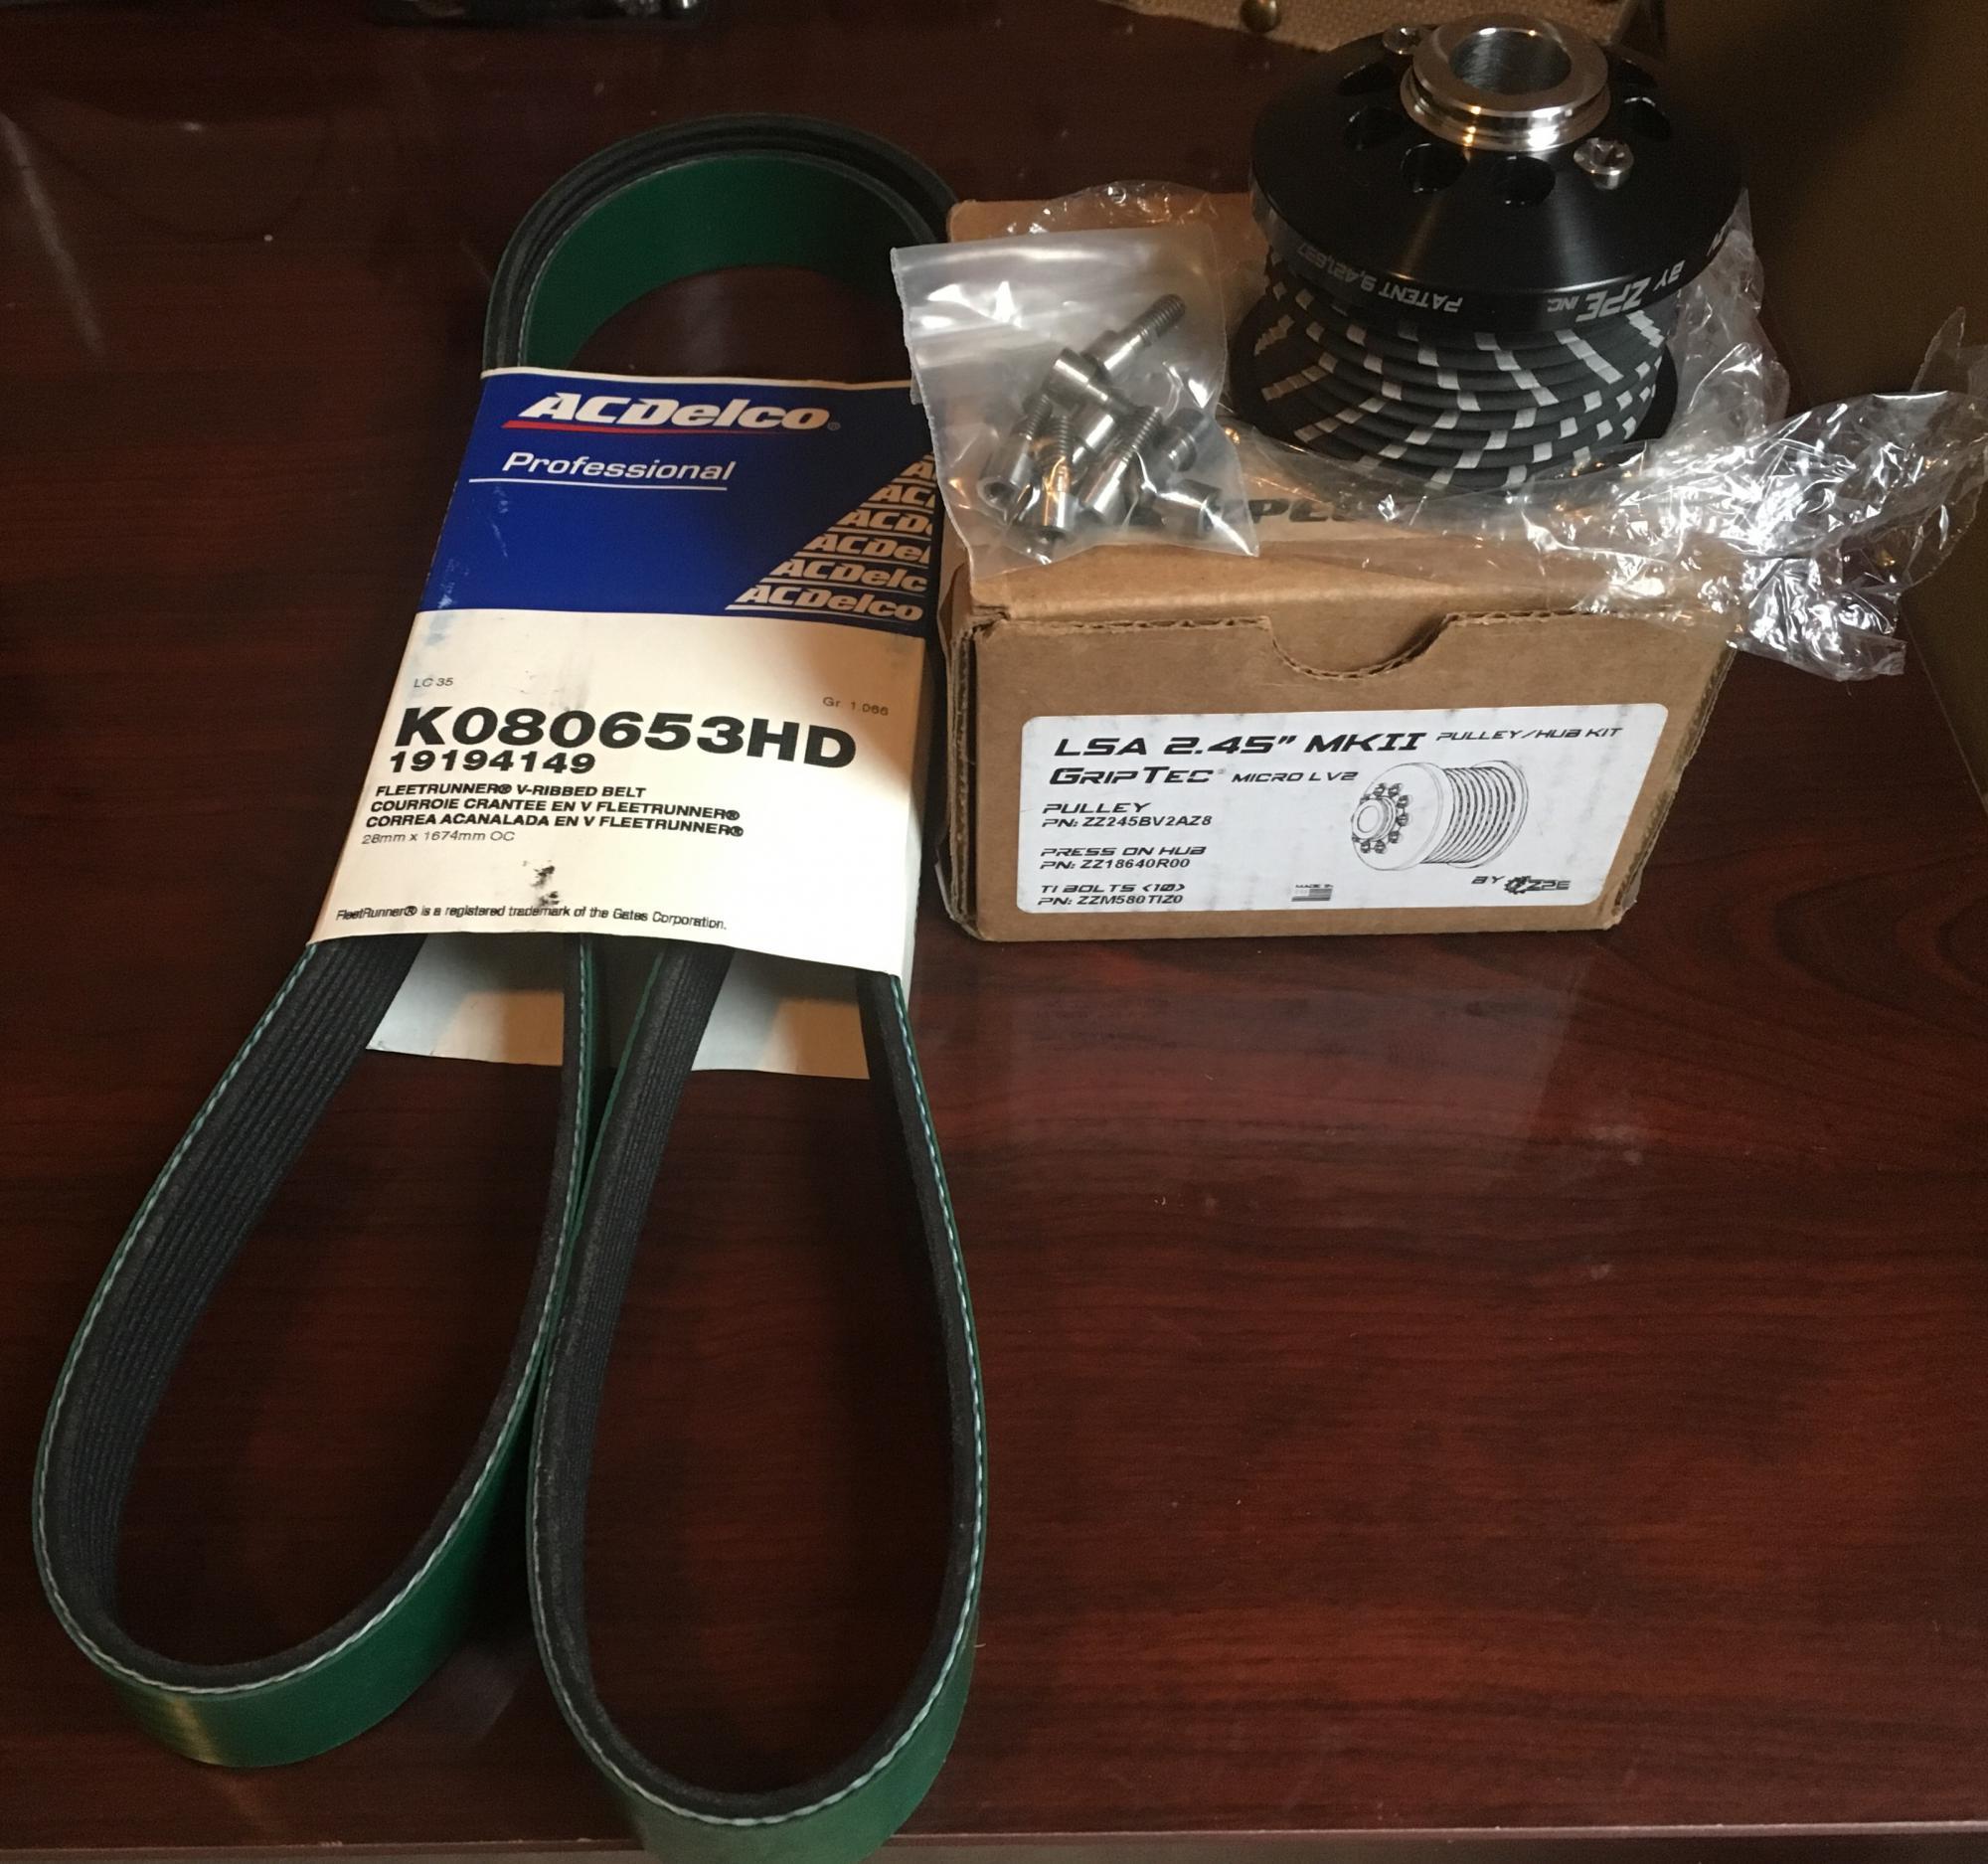 ARH headers/xpipe, griptec pulley, trunk tank, spark plugs, solid iso, motor mounts-img_4407.jpg